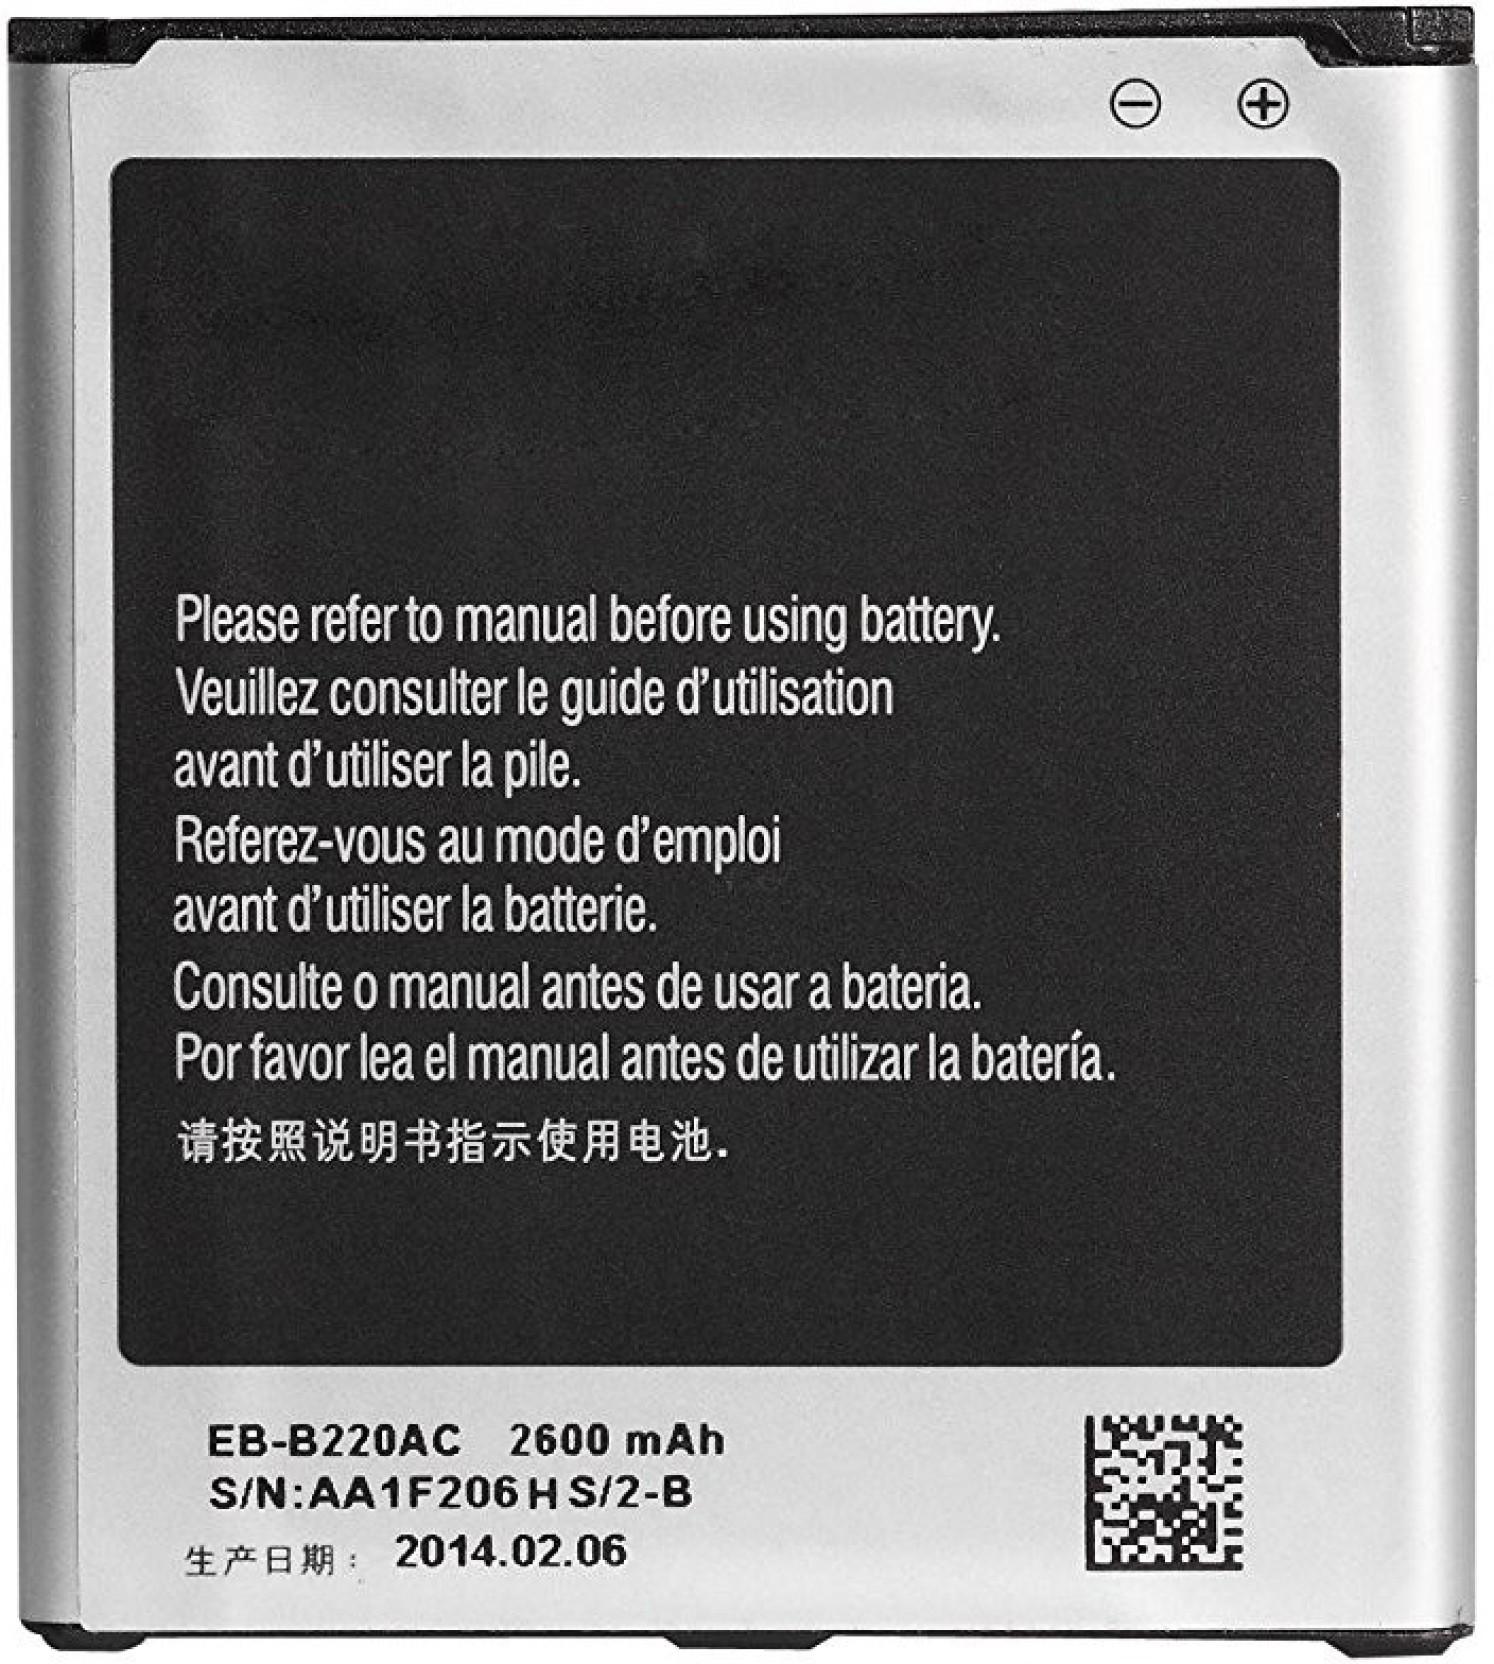 ShopSmart Mobile Battery For SAMSUNG Galaxy Grand 2 G7102 / G7106